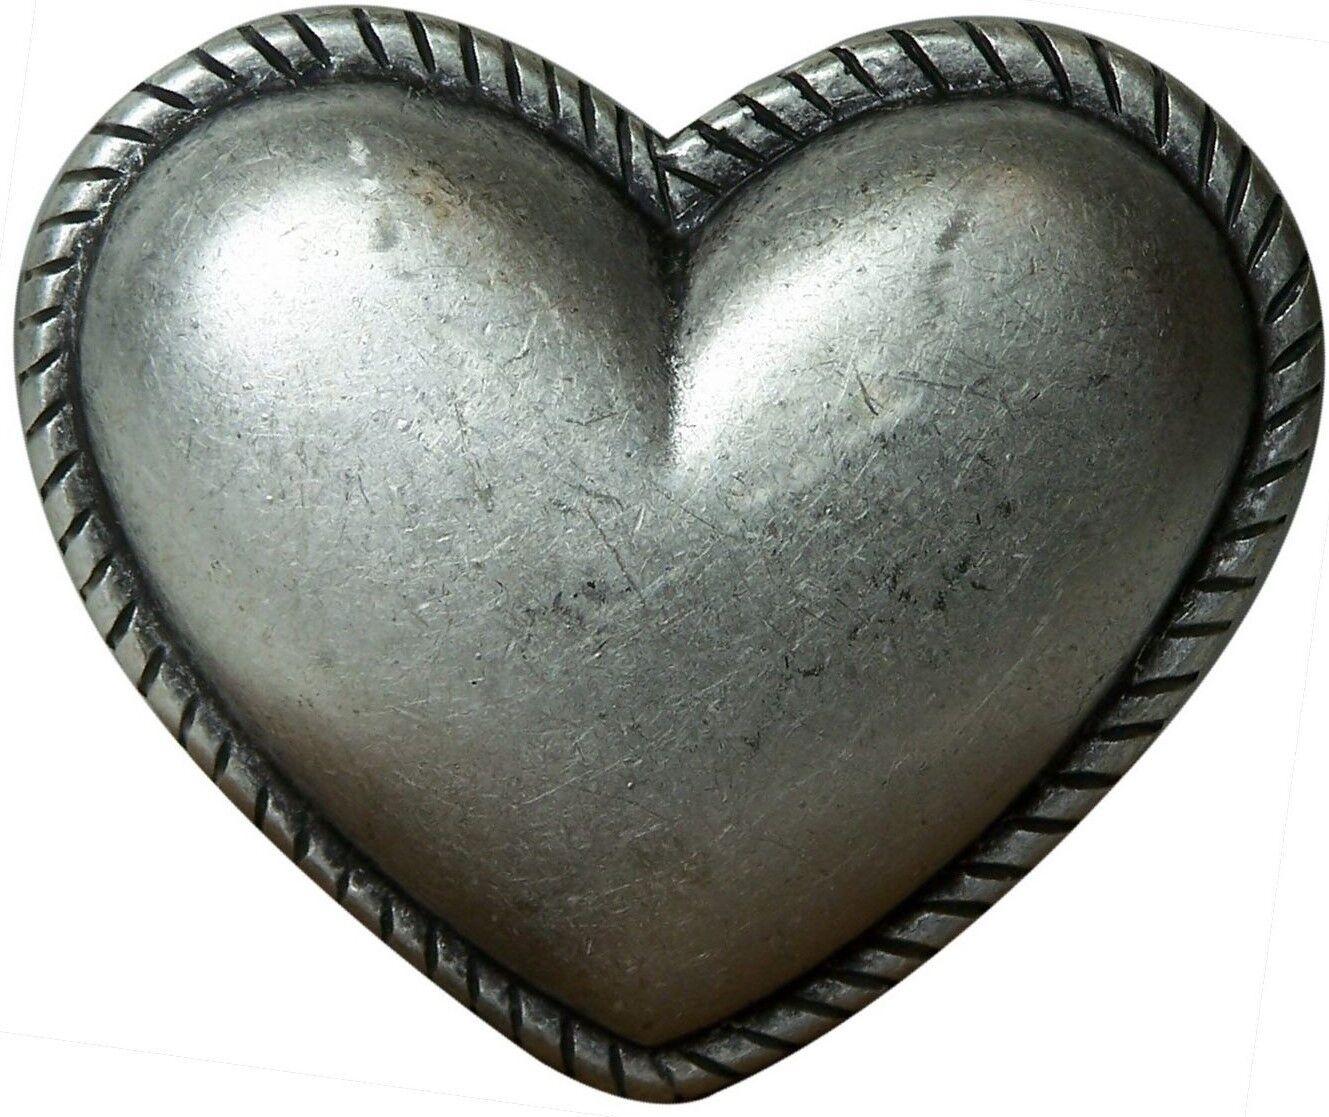 FRONHOFER Heart belt buckle, antique silver, for women, 1.5